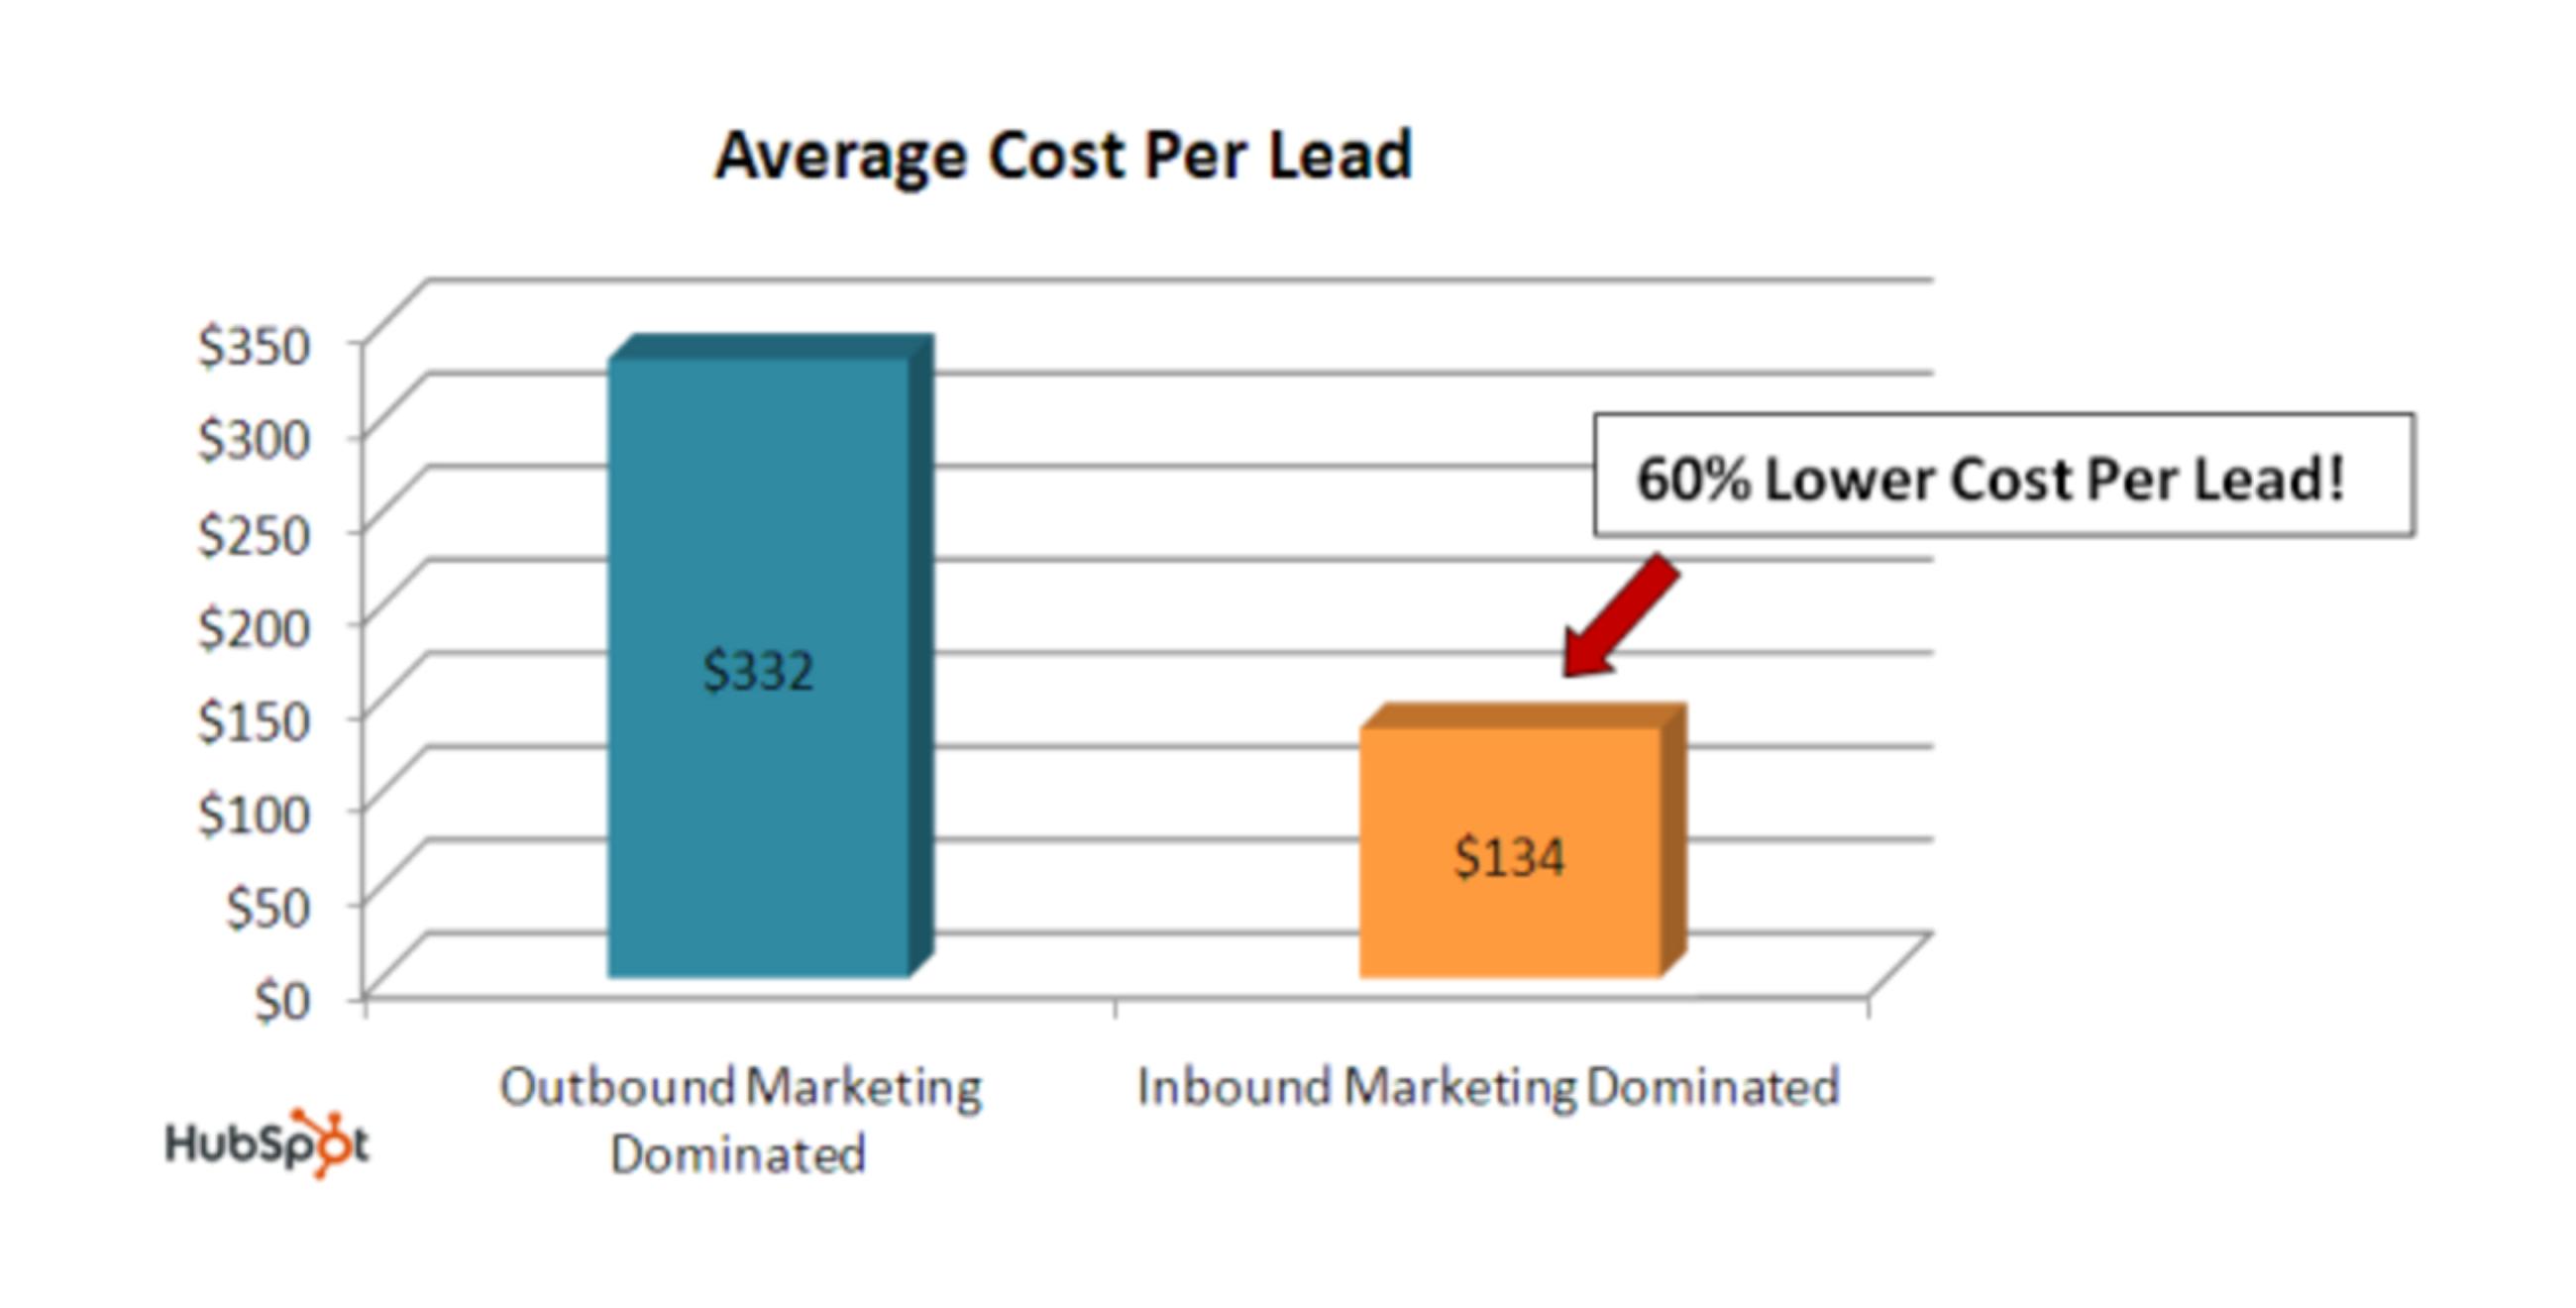 average-cost-per-lead-impulse.png